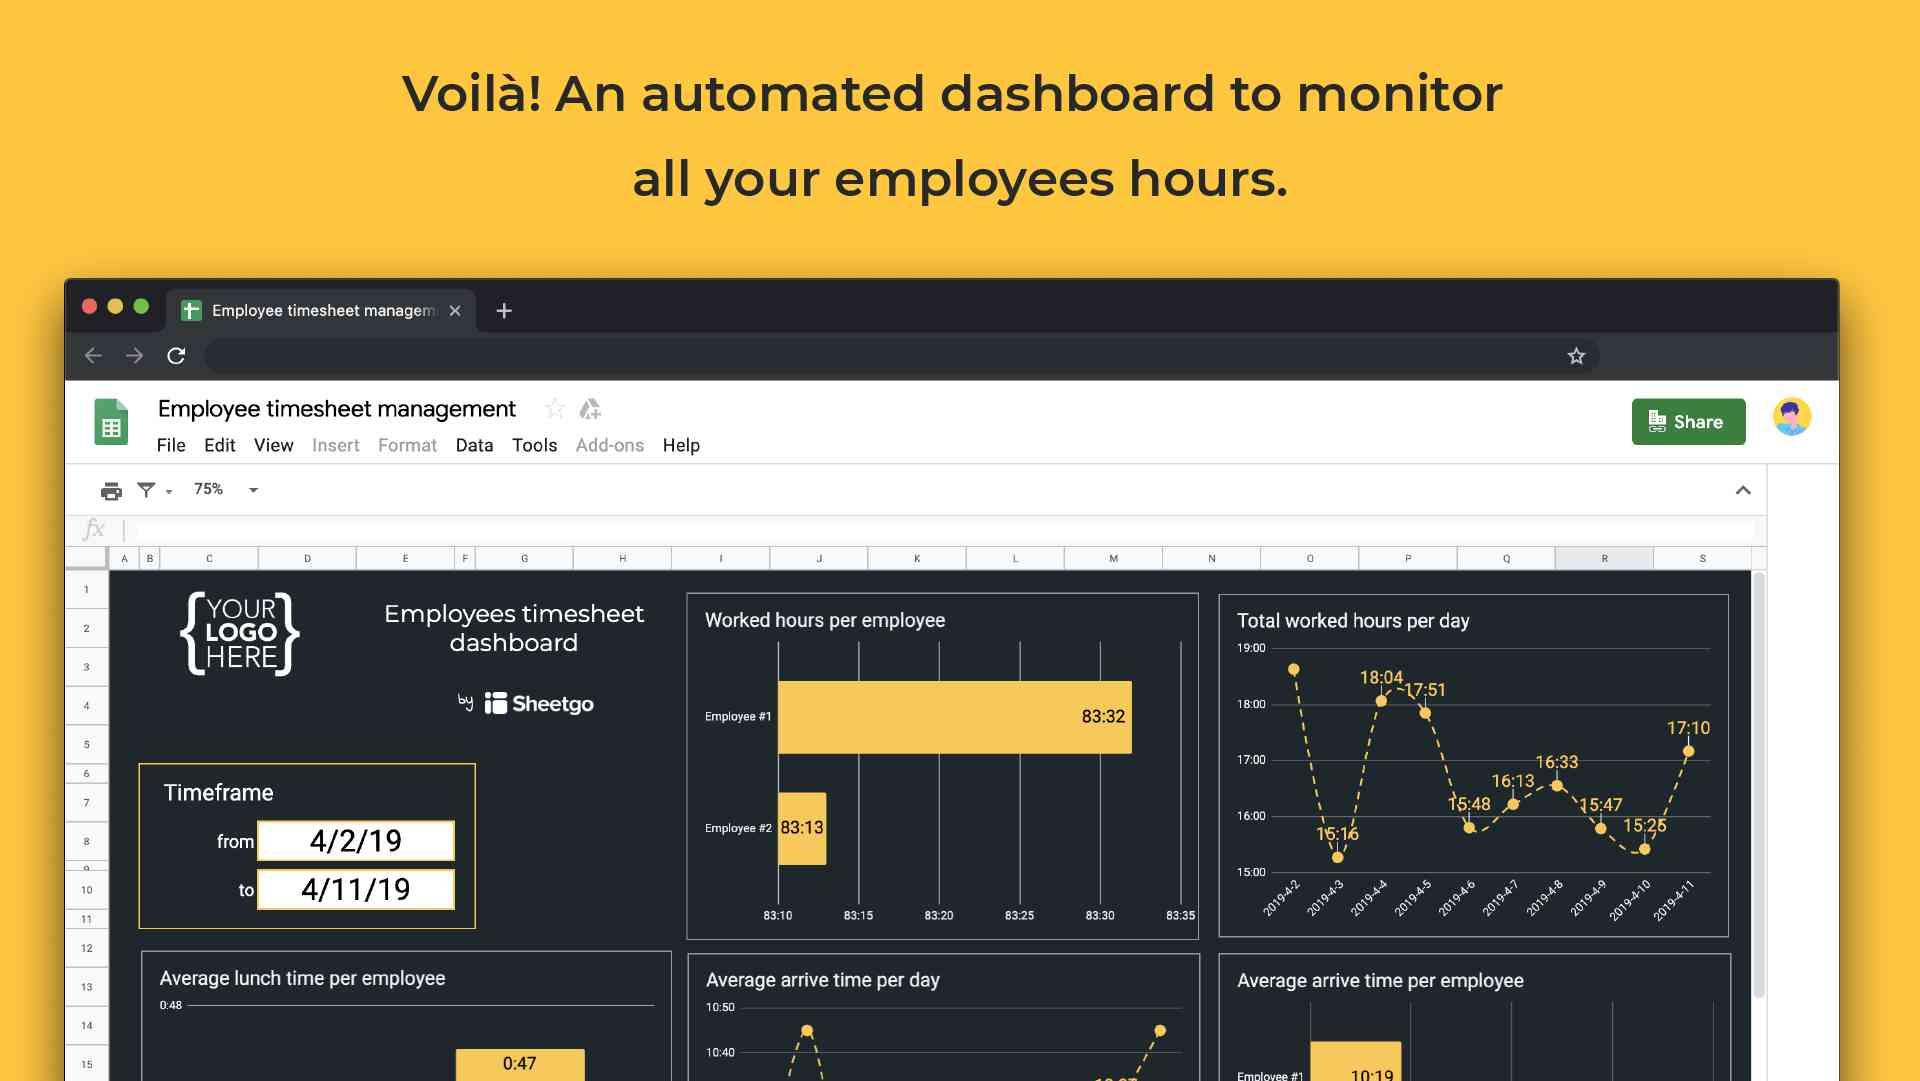 Employee timesheet template dashboard